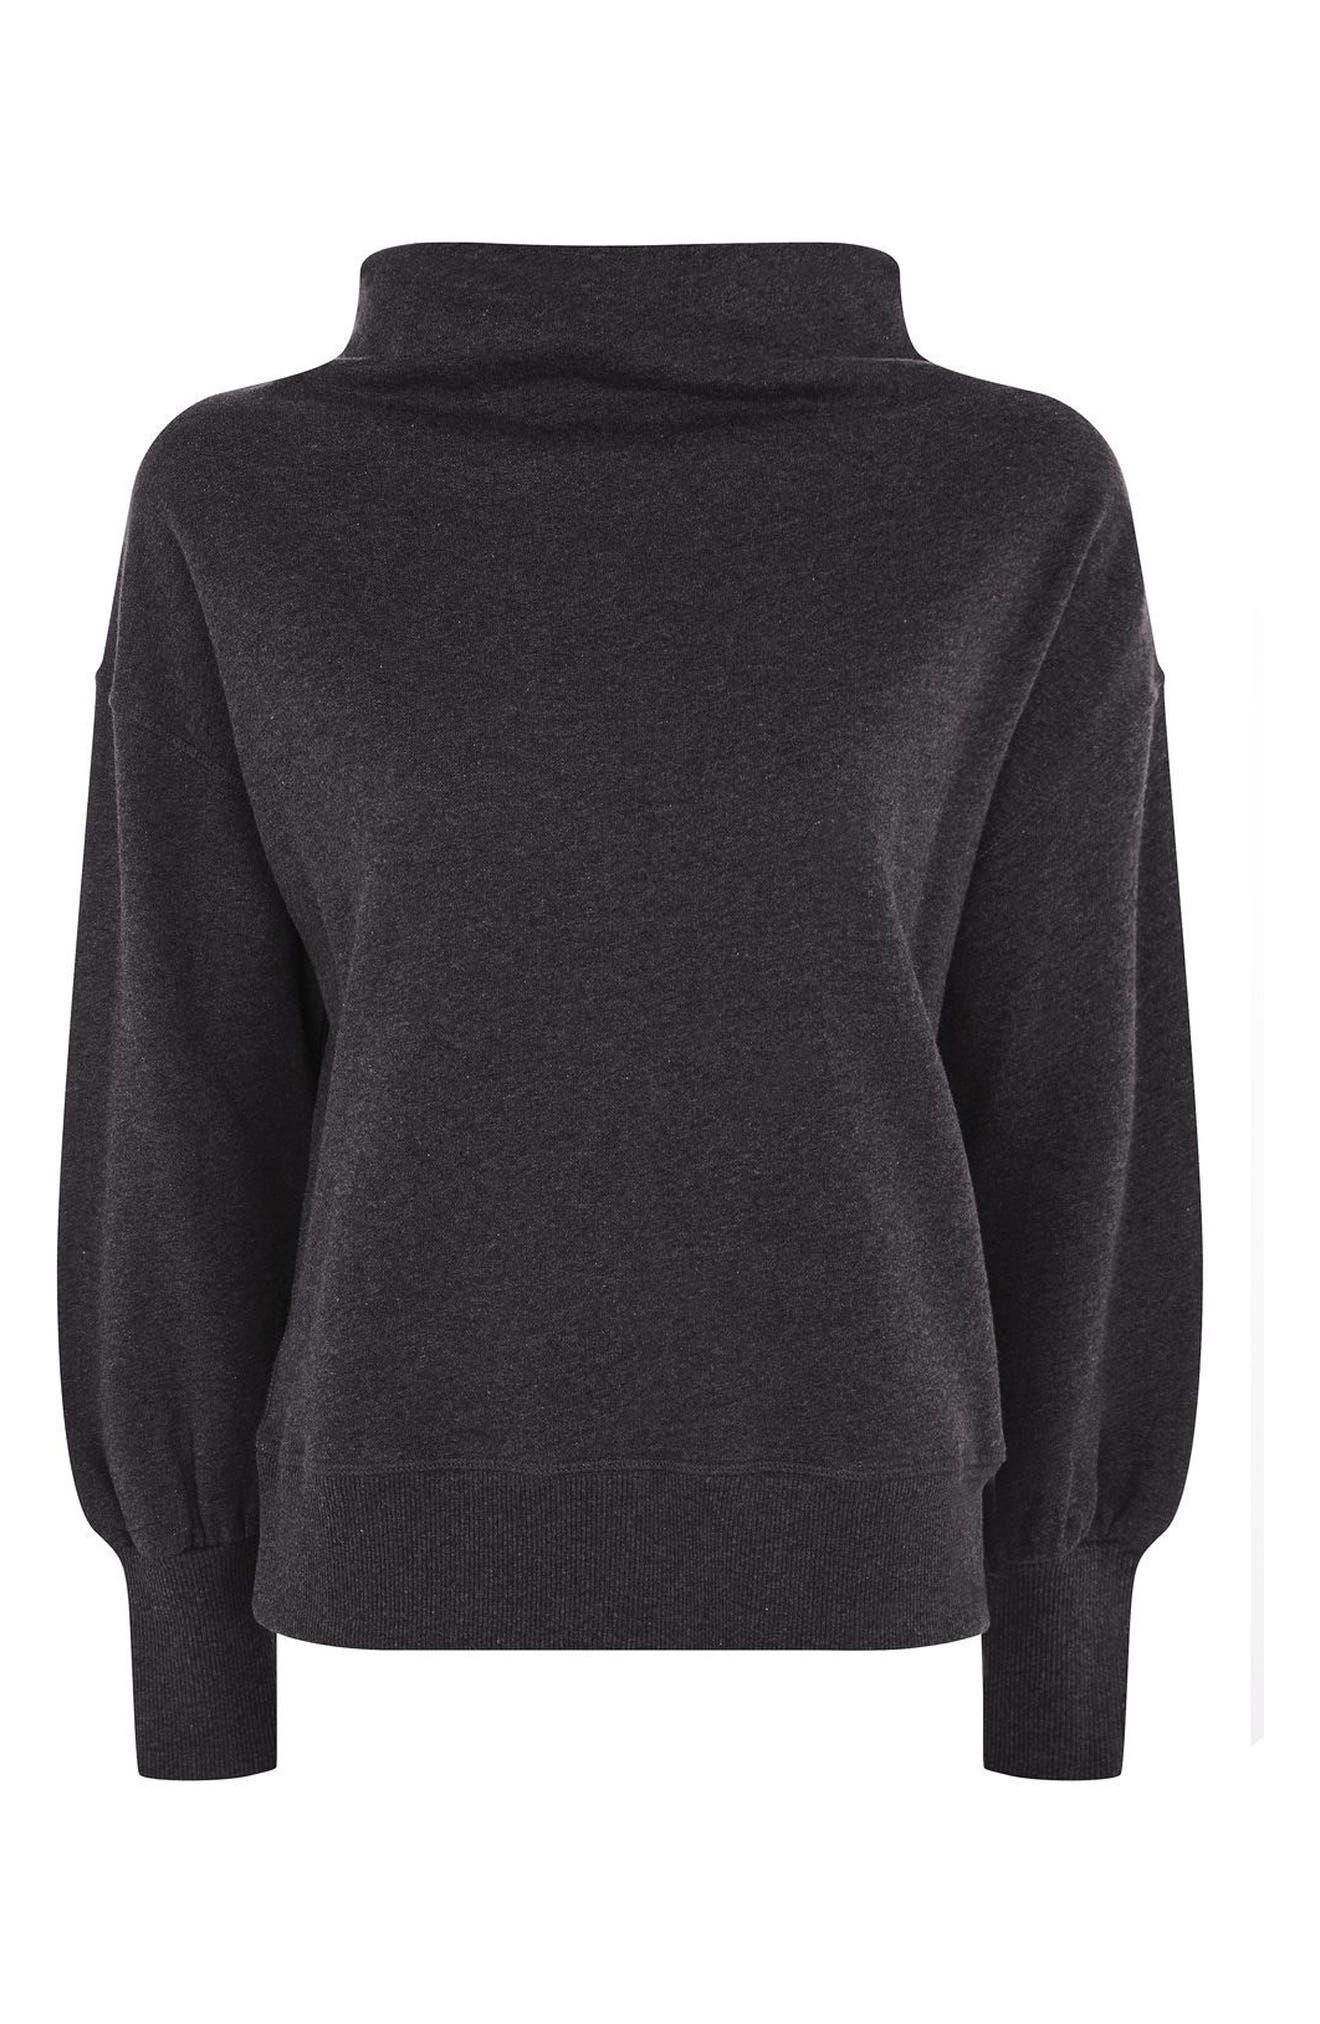 Topshop Boutique Slash Neck Sweatshirt